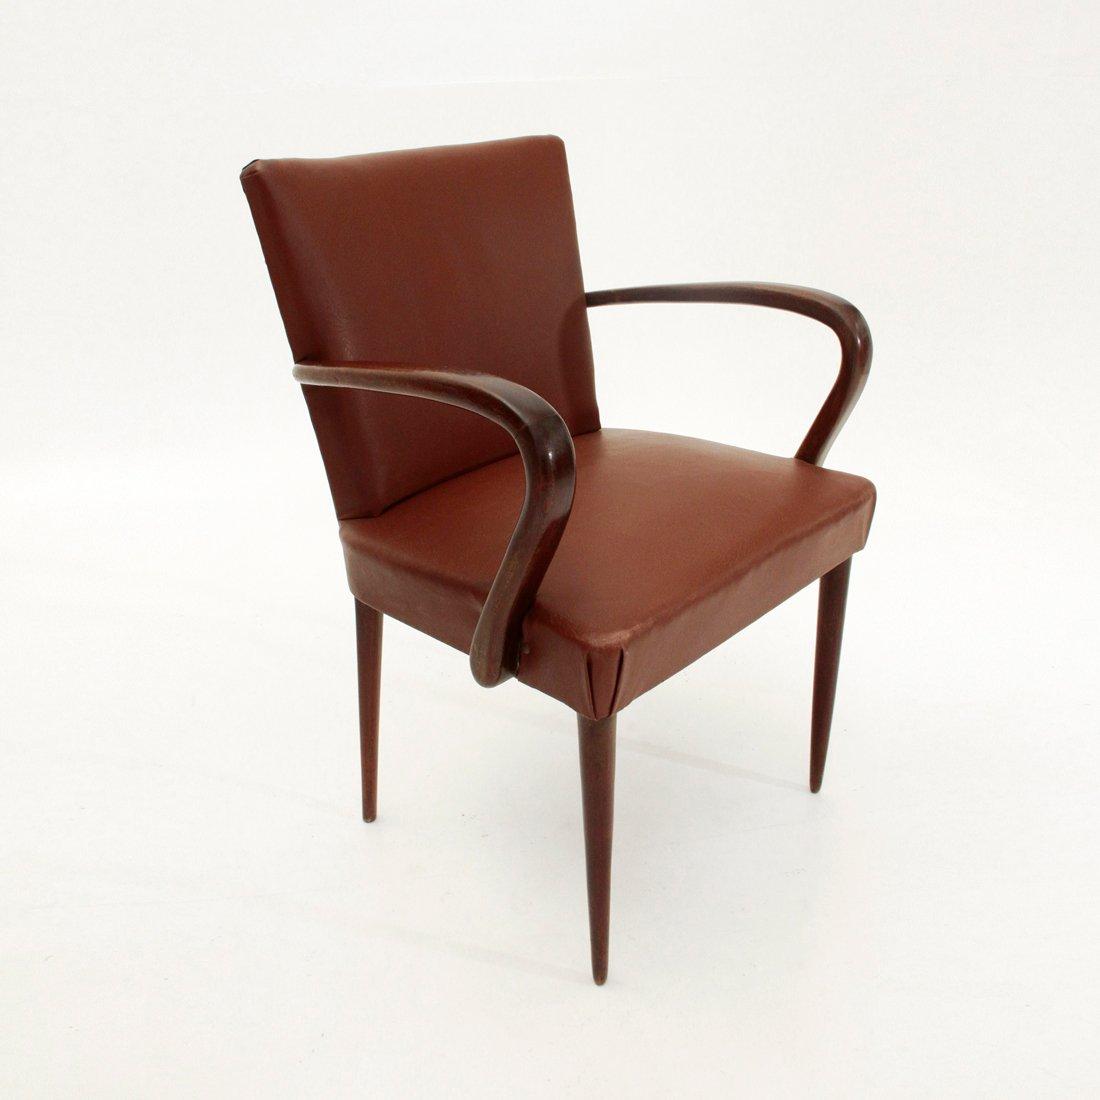 Italian Art Deco Armchair 1930s For Sale At Pamono